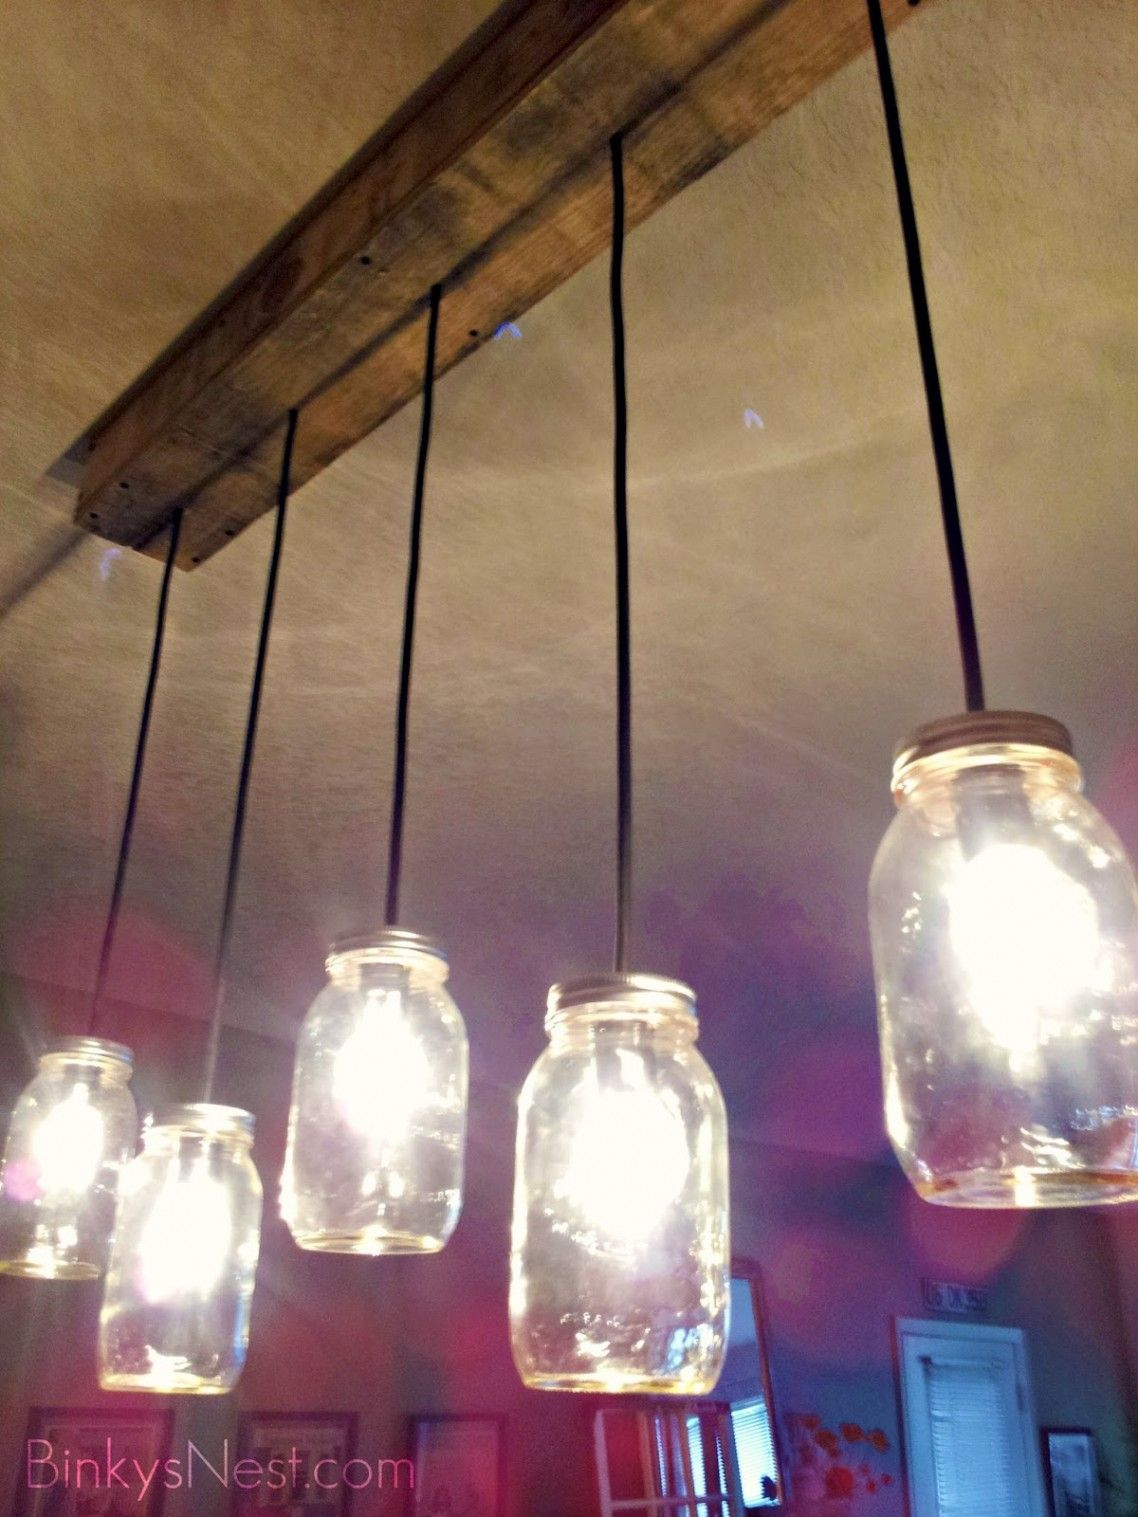 Rustic Hanging Light Kitchen Ceiling Lights Bulb Fixtures Lighting ...